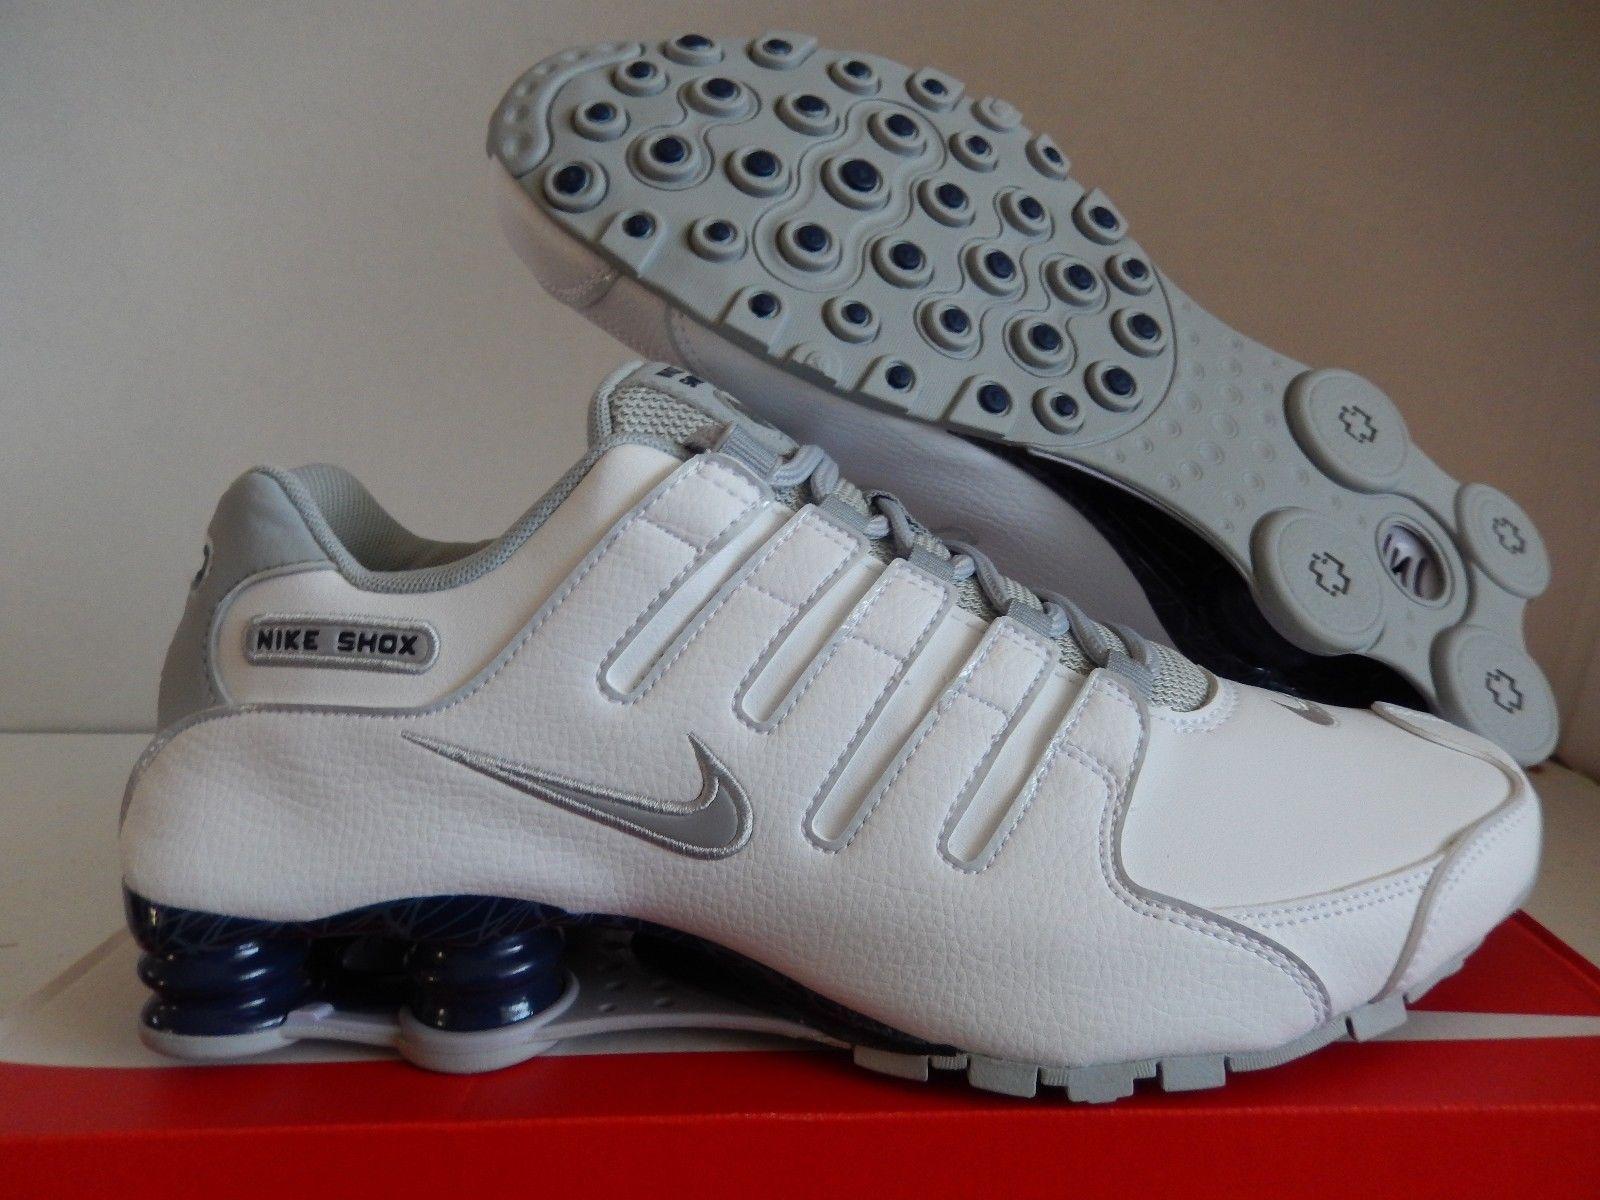 Nike Shox Mens Dîner Blanc jeu explorer mZeGg2U